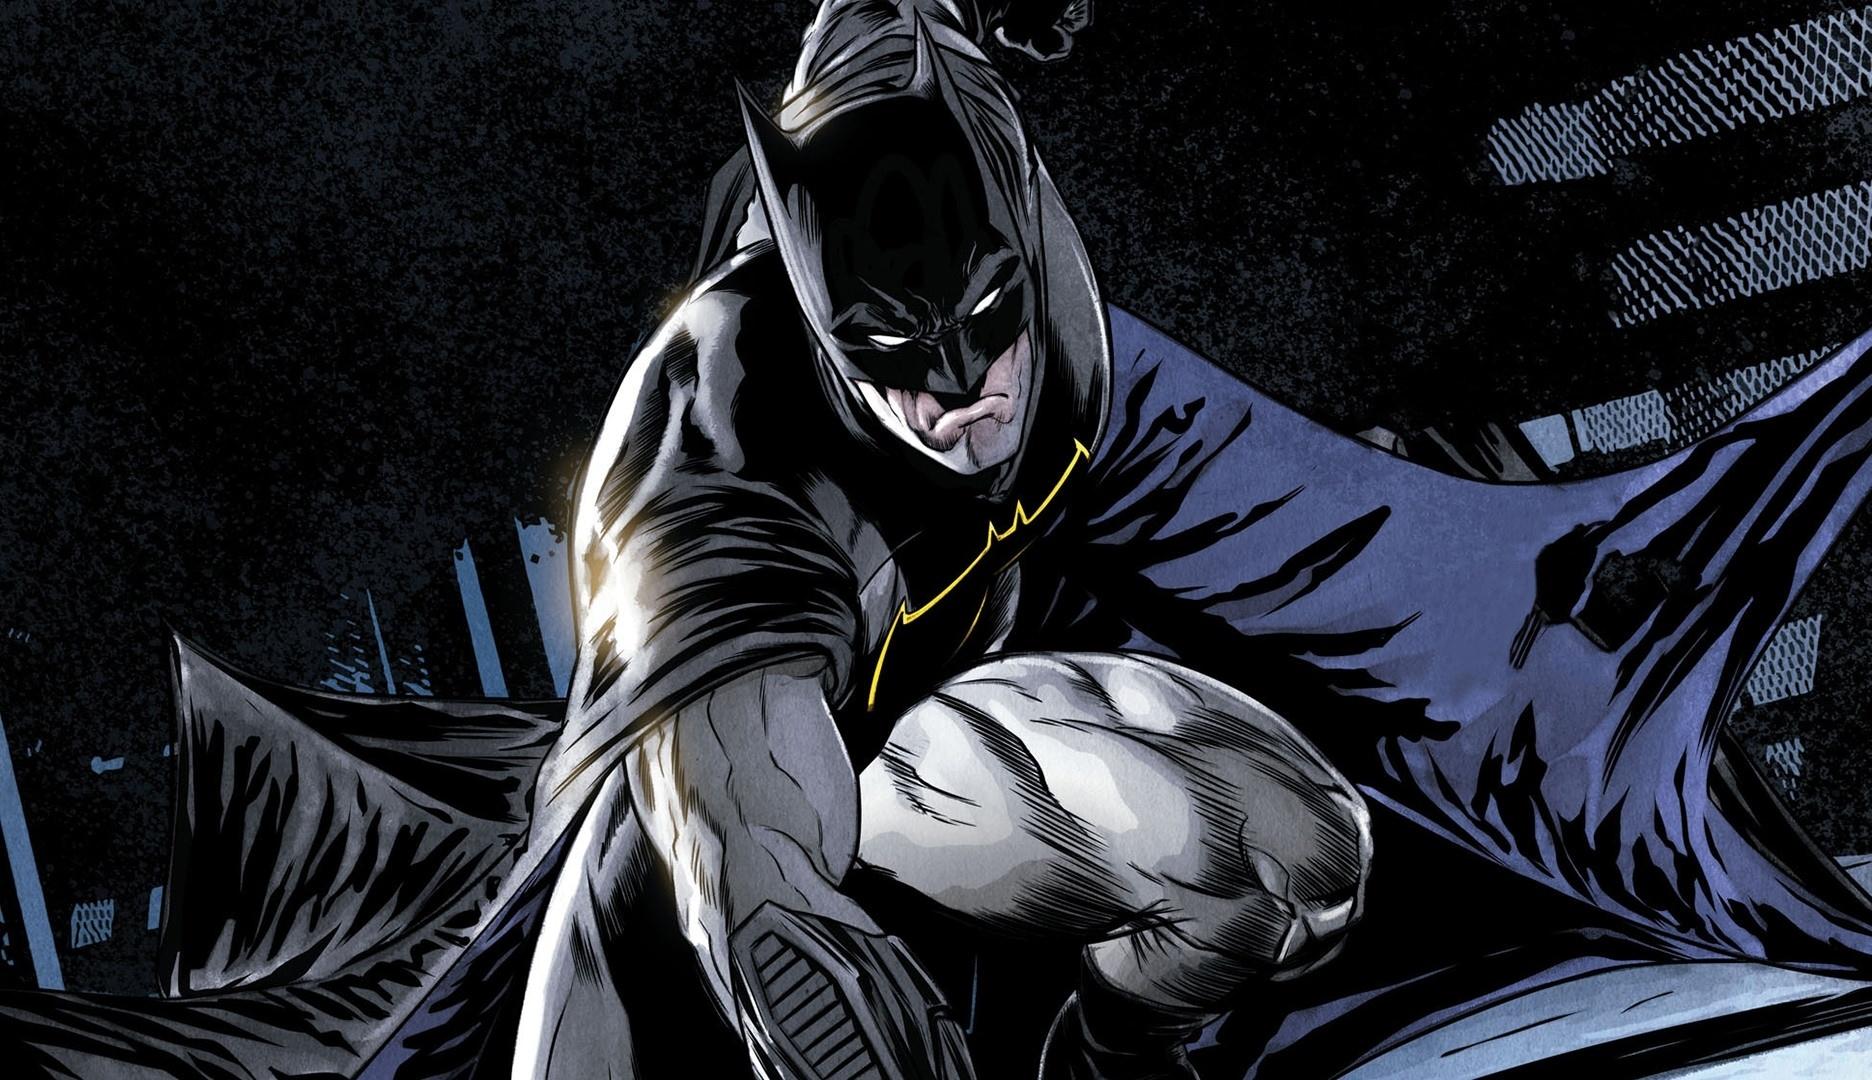 Comics, batman, dark knight, superhero, 1920x1080 wallpaper